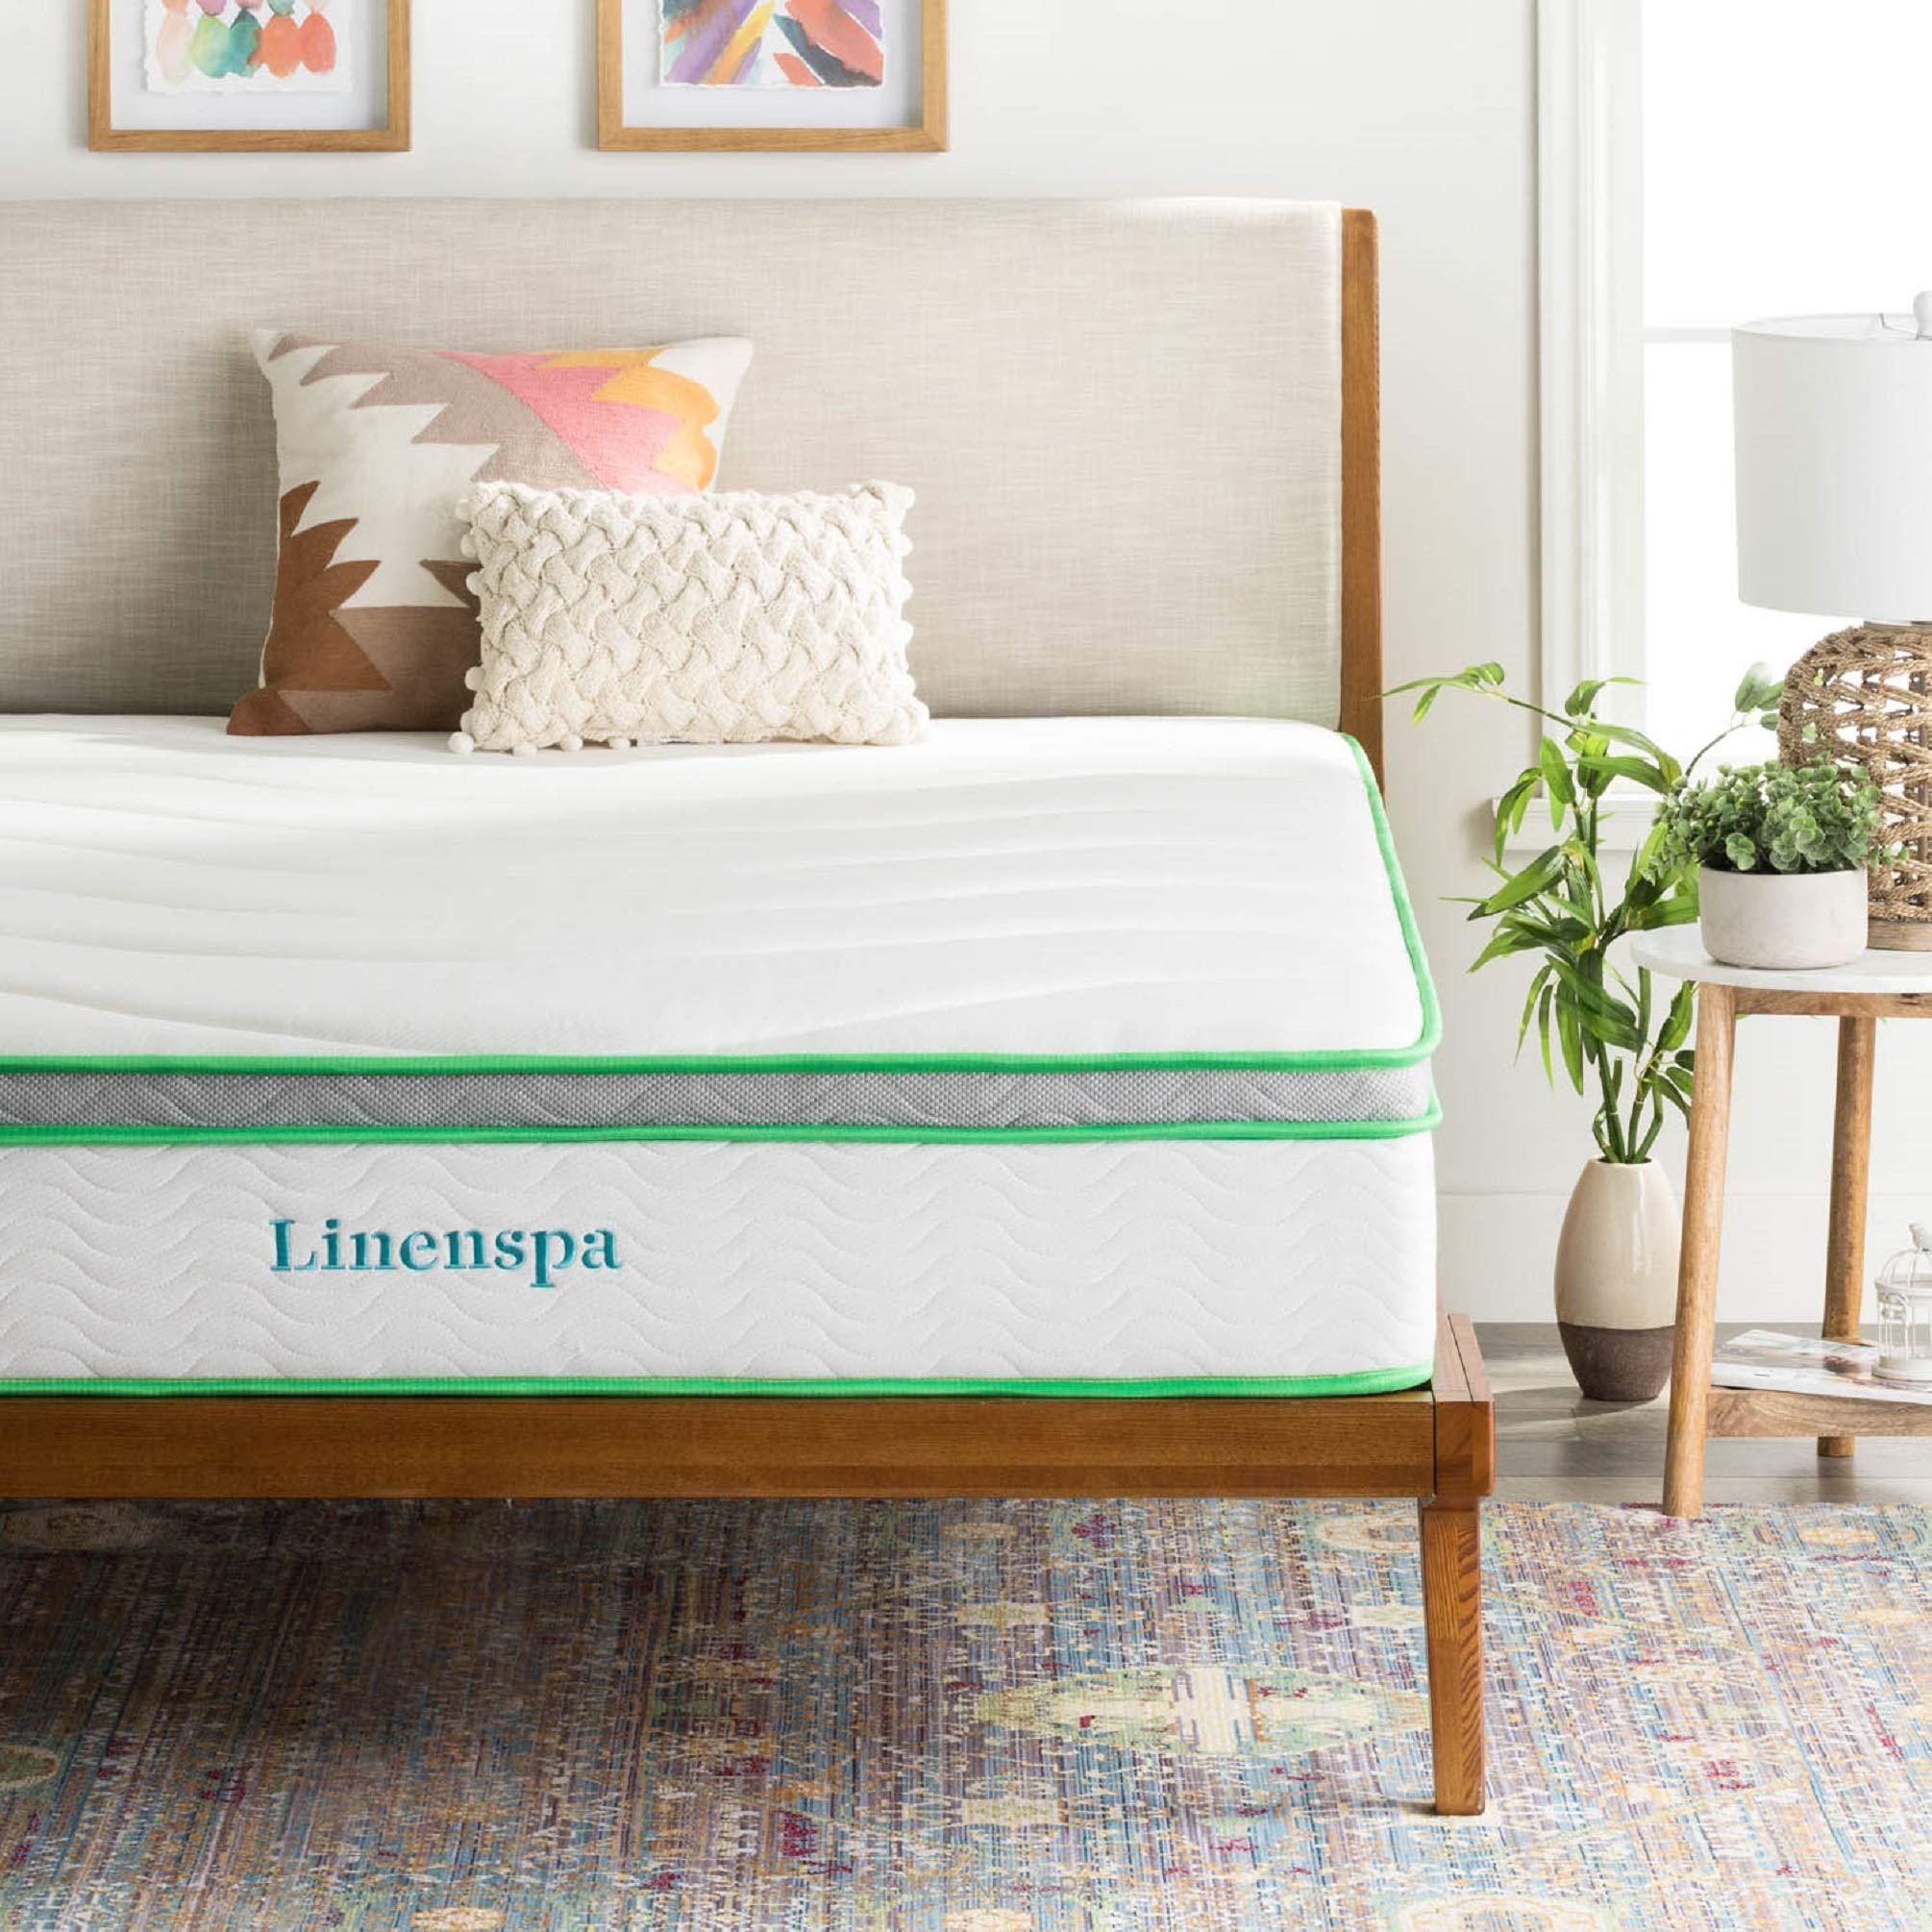 LINENSPA 10 Inch Latex Hybrid Mattress - Supportive - Responsive Feel - Medium Firm - Temperature Neutral - Queen by Linenspa